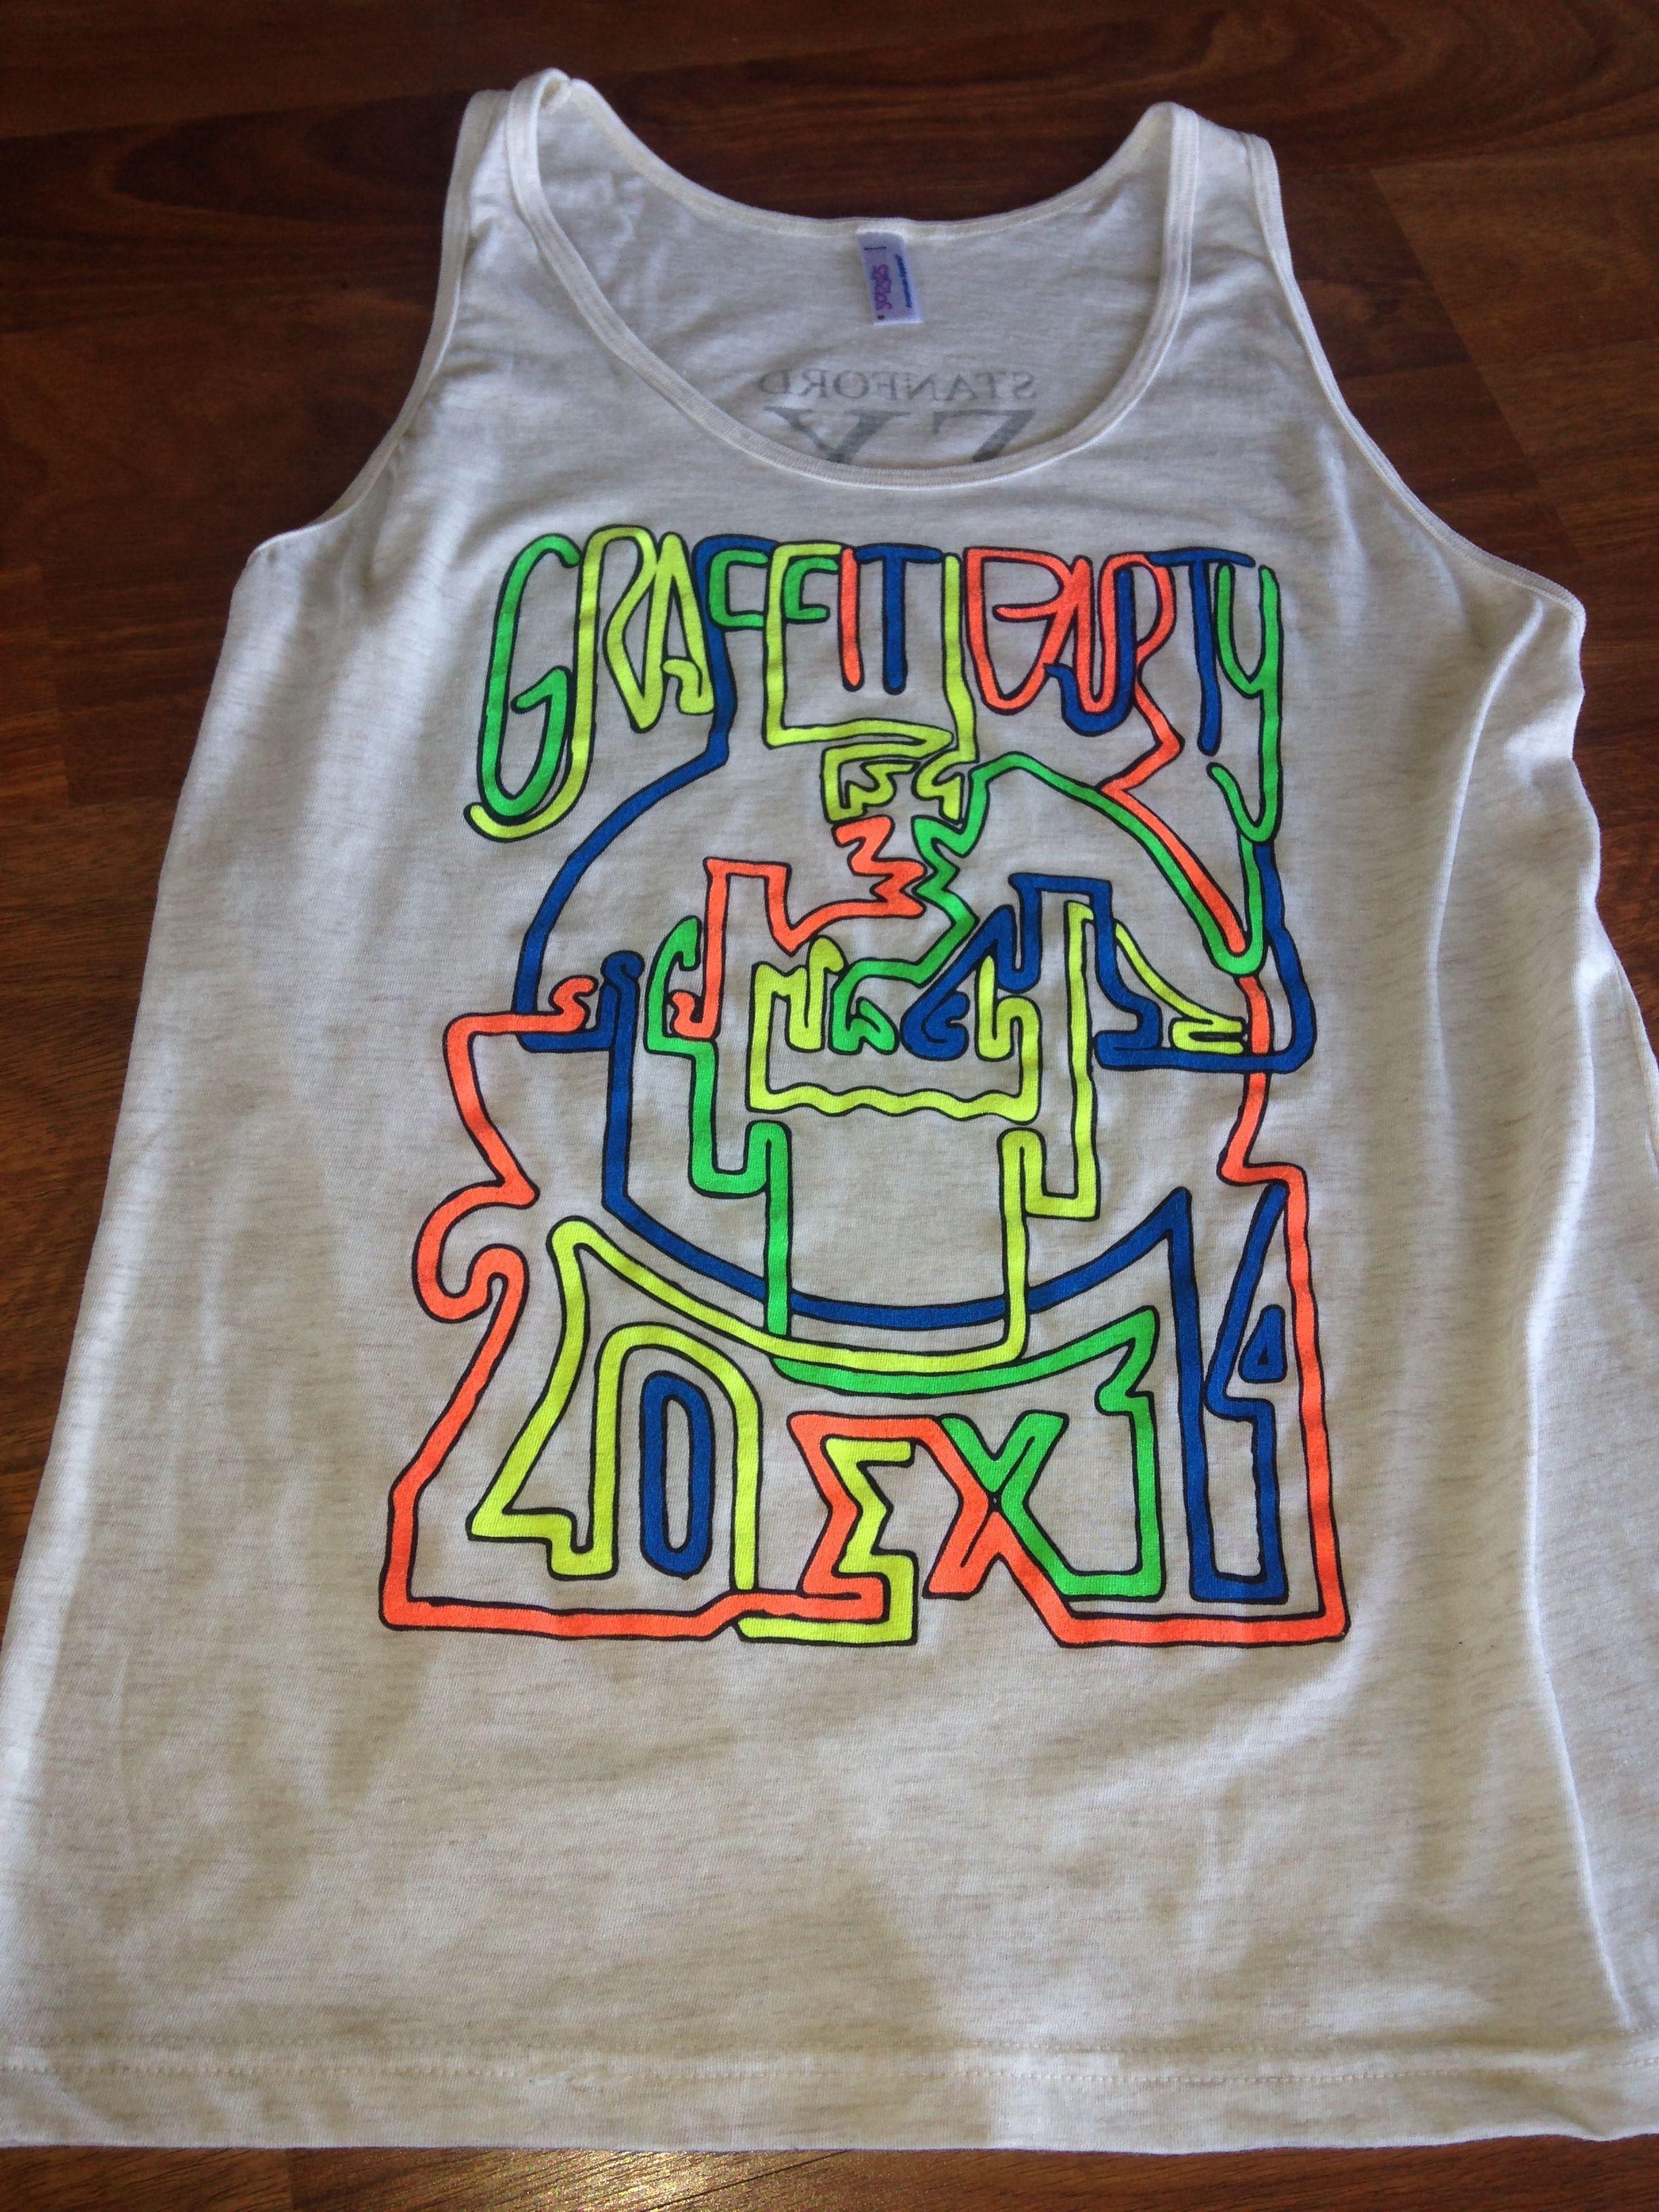 Black light t shirt ideas - Sigma Chi Ex Stanford University Graffiti Party Black Light Shirts